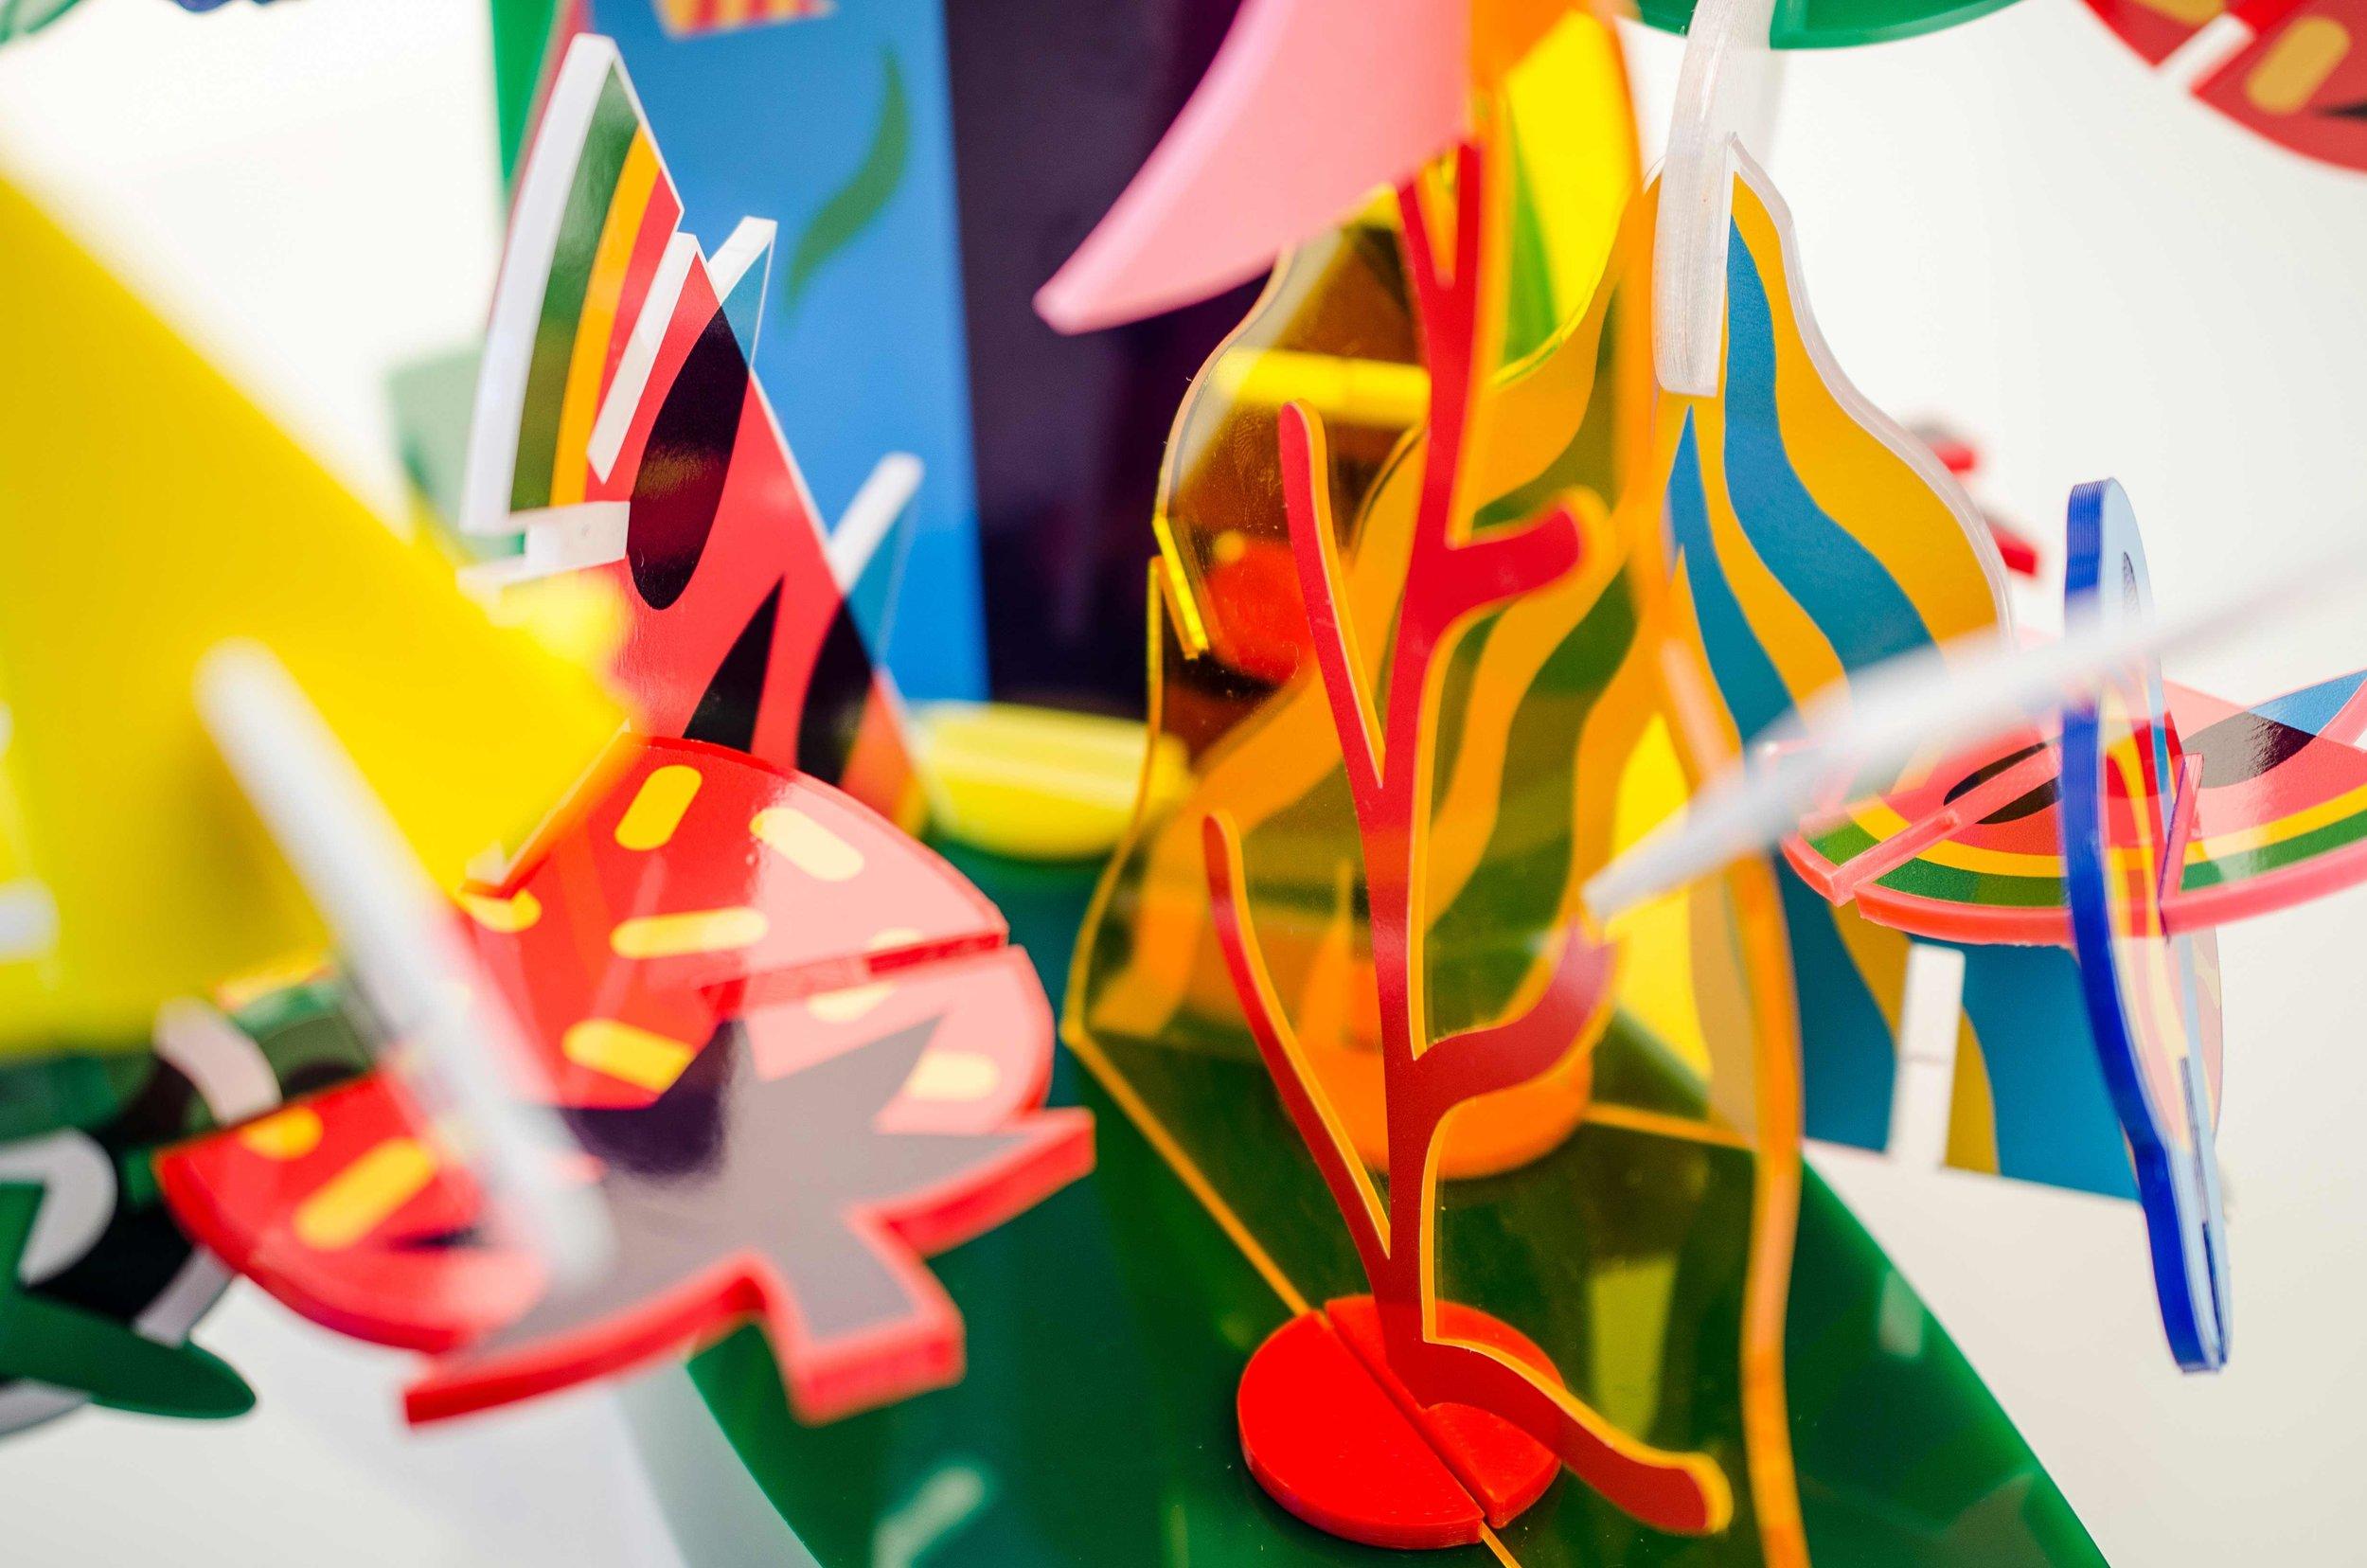 Zinghowdesign_Perrier-sculpture-395.jpg